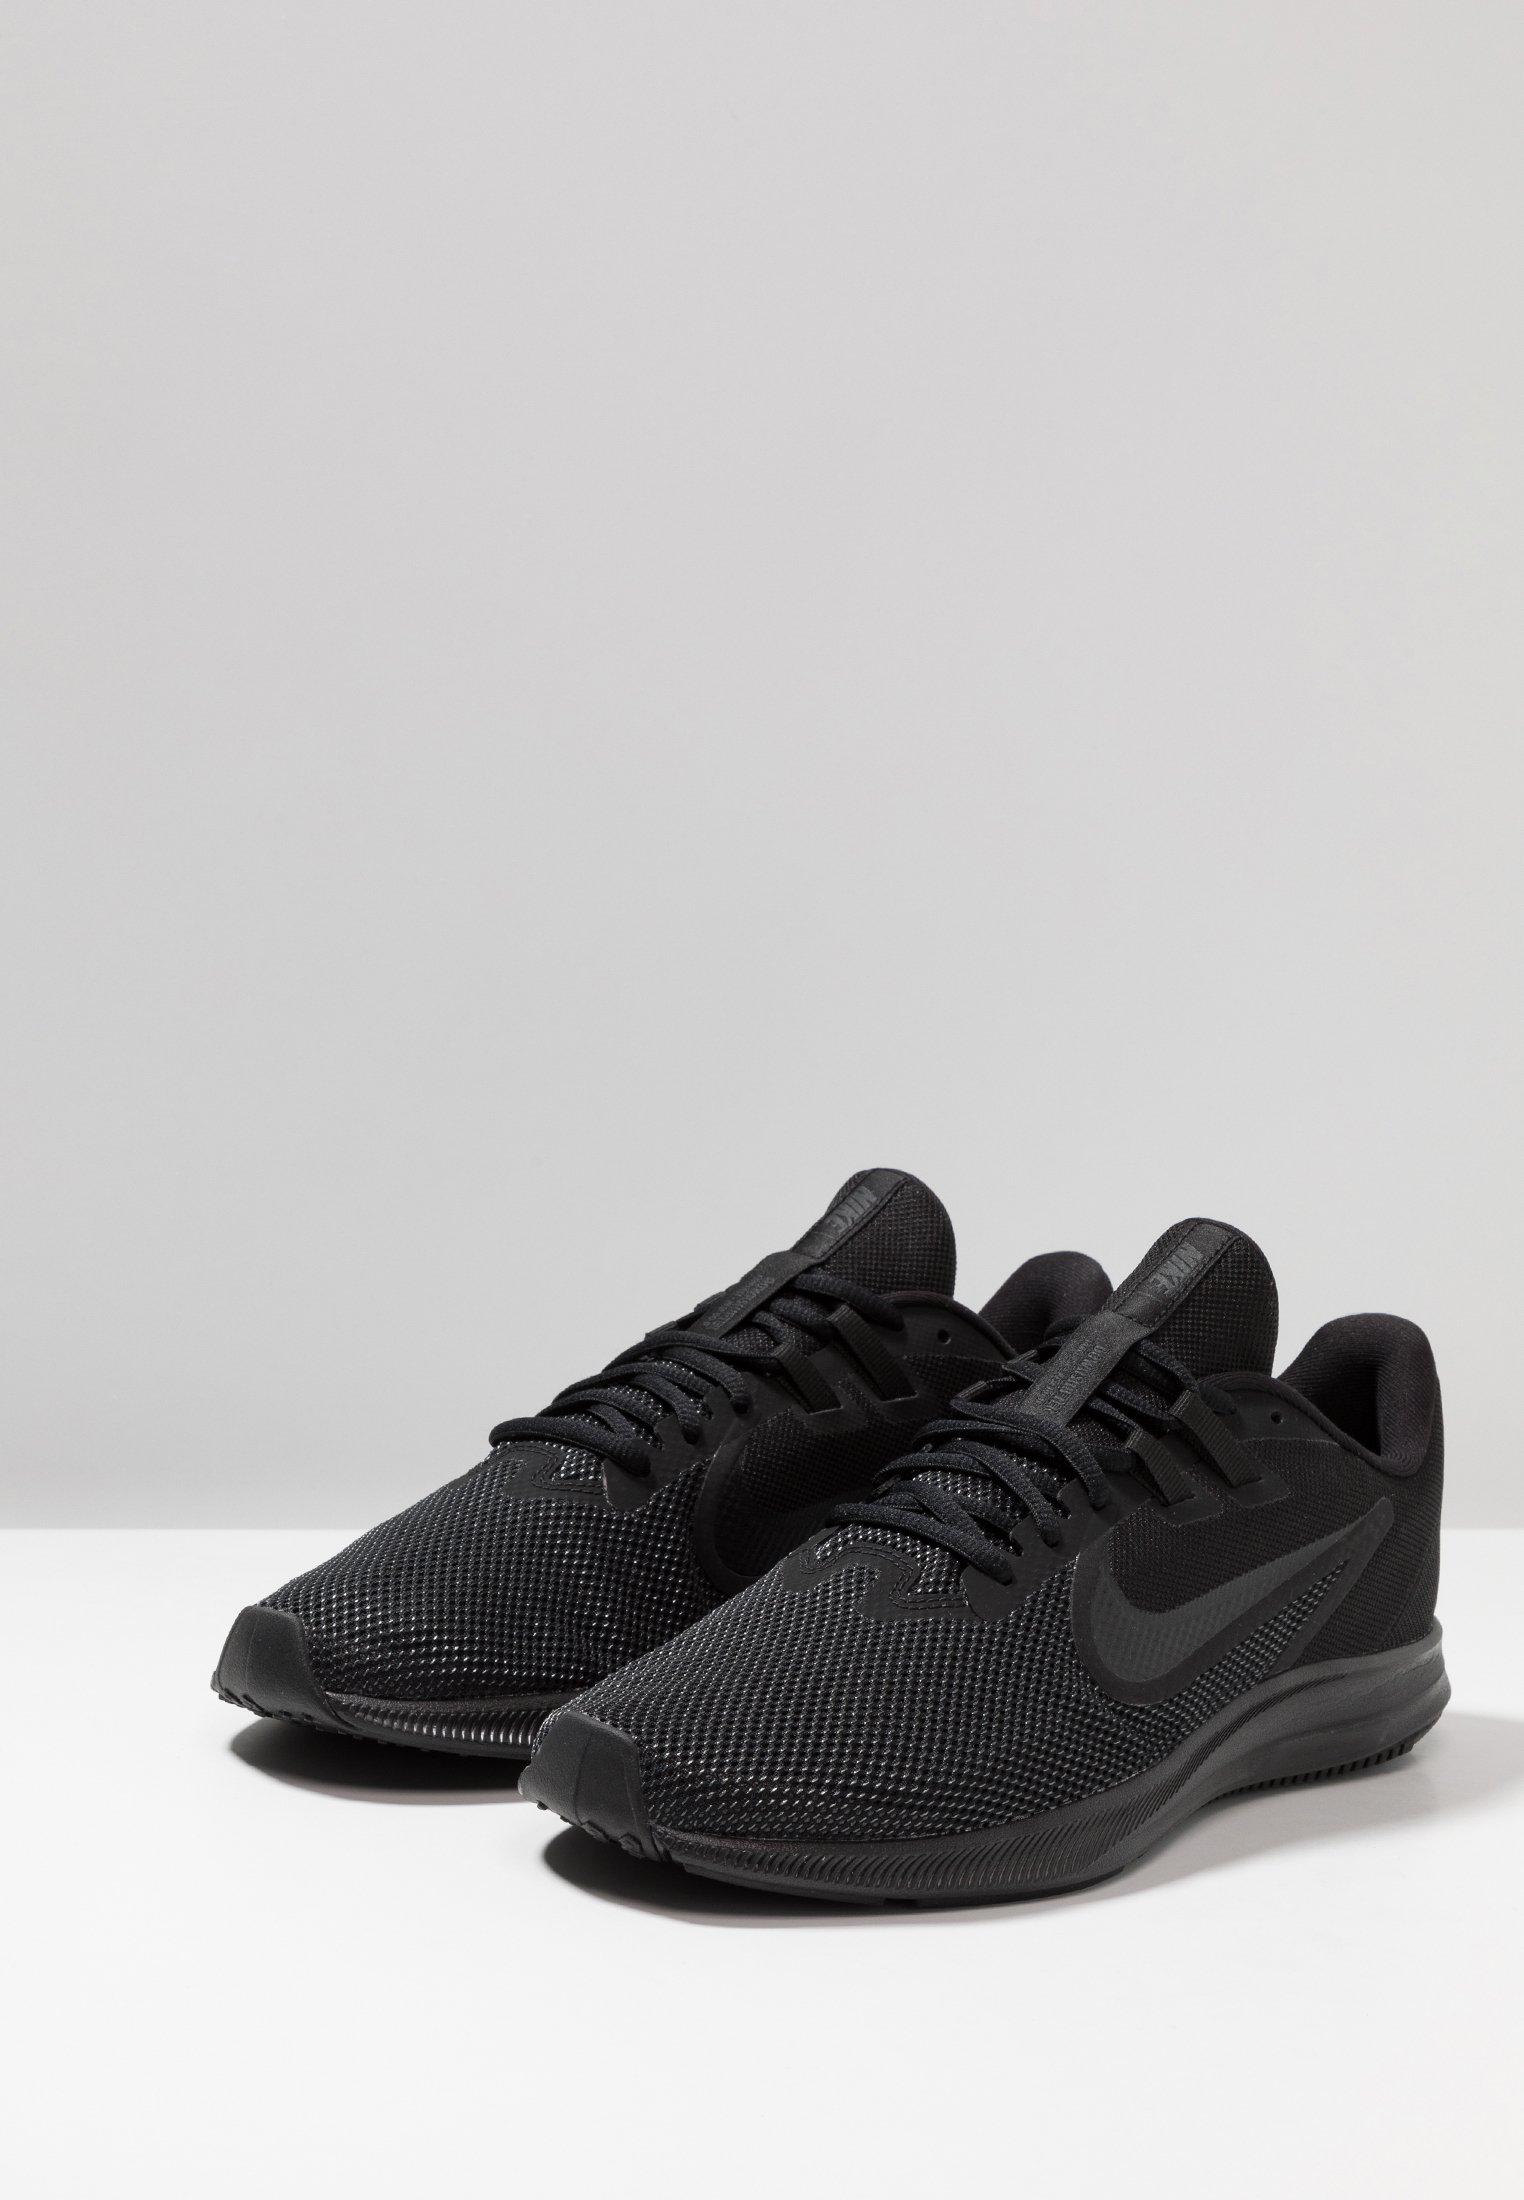 De Black anthracite DownshifterChaussures Nike Neutres Running Performance WdCxeoBr